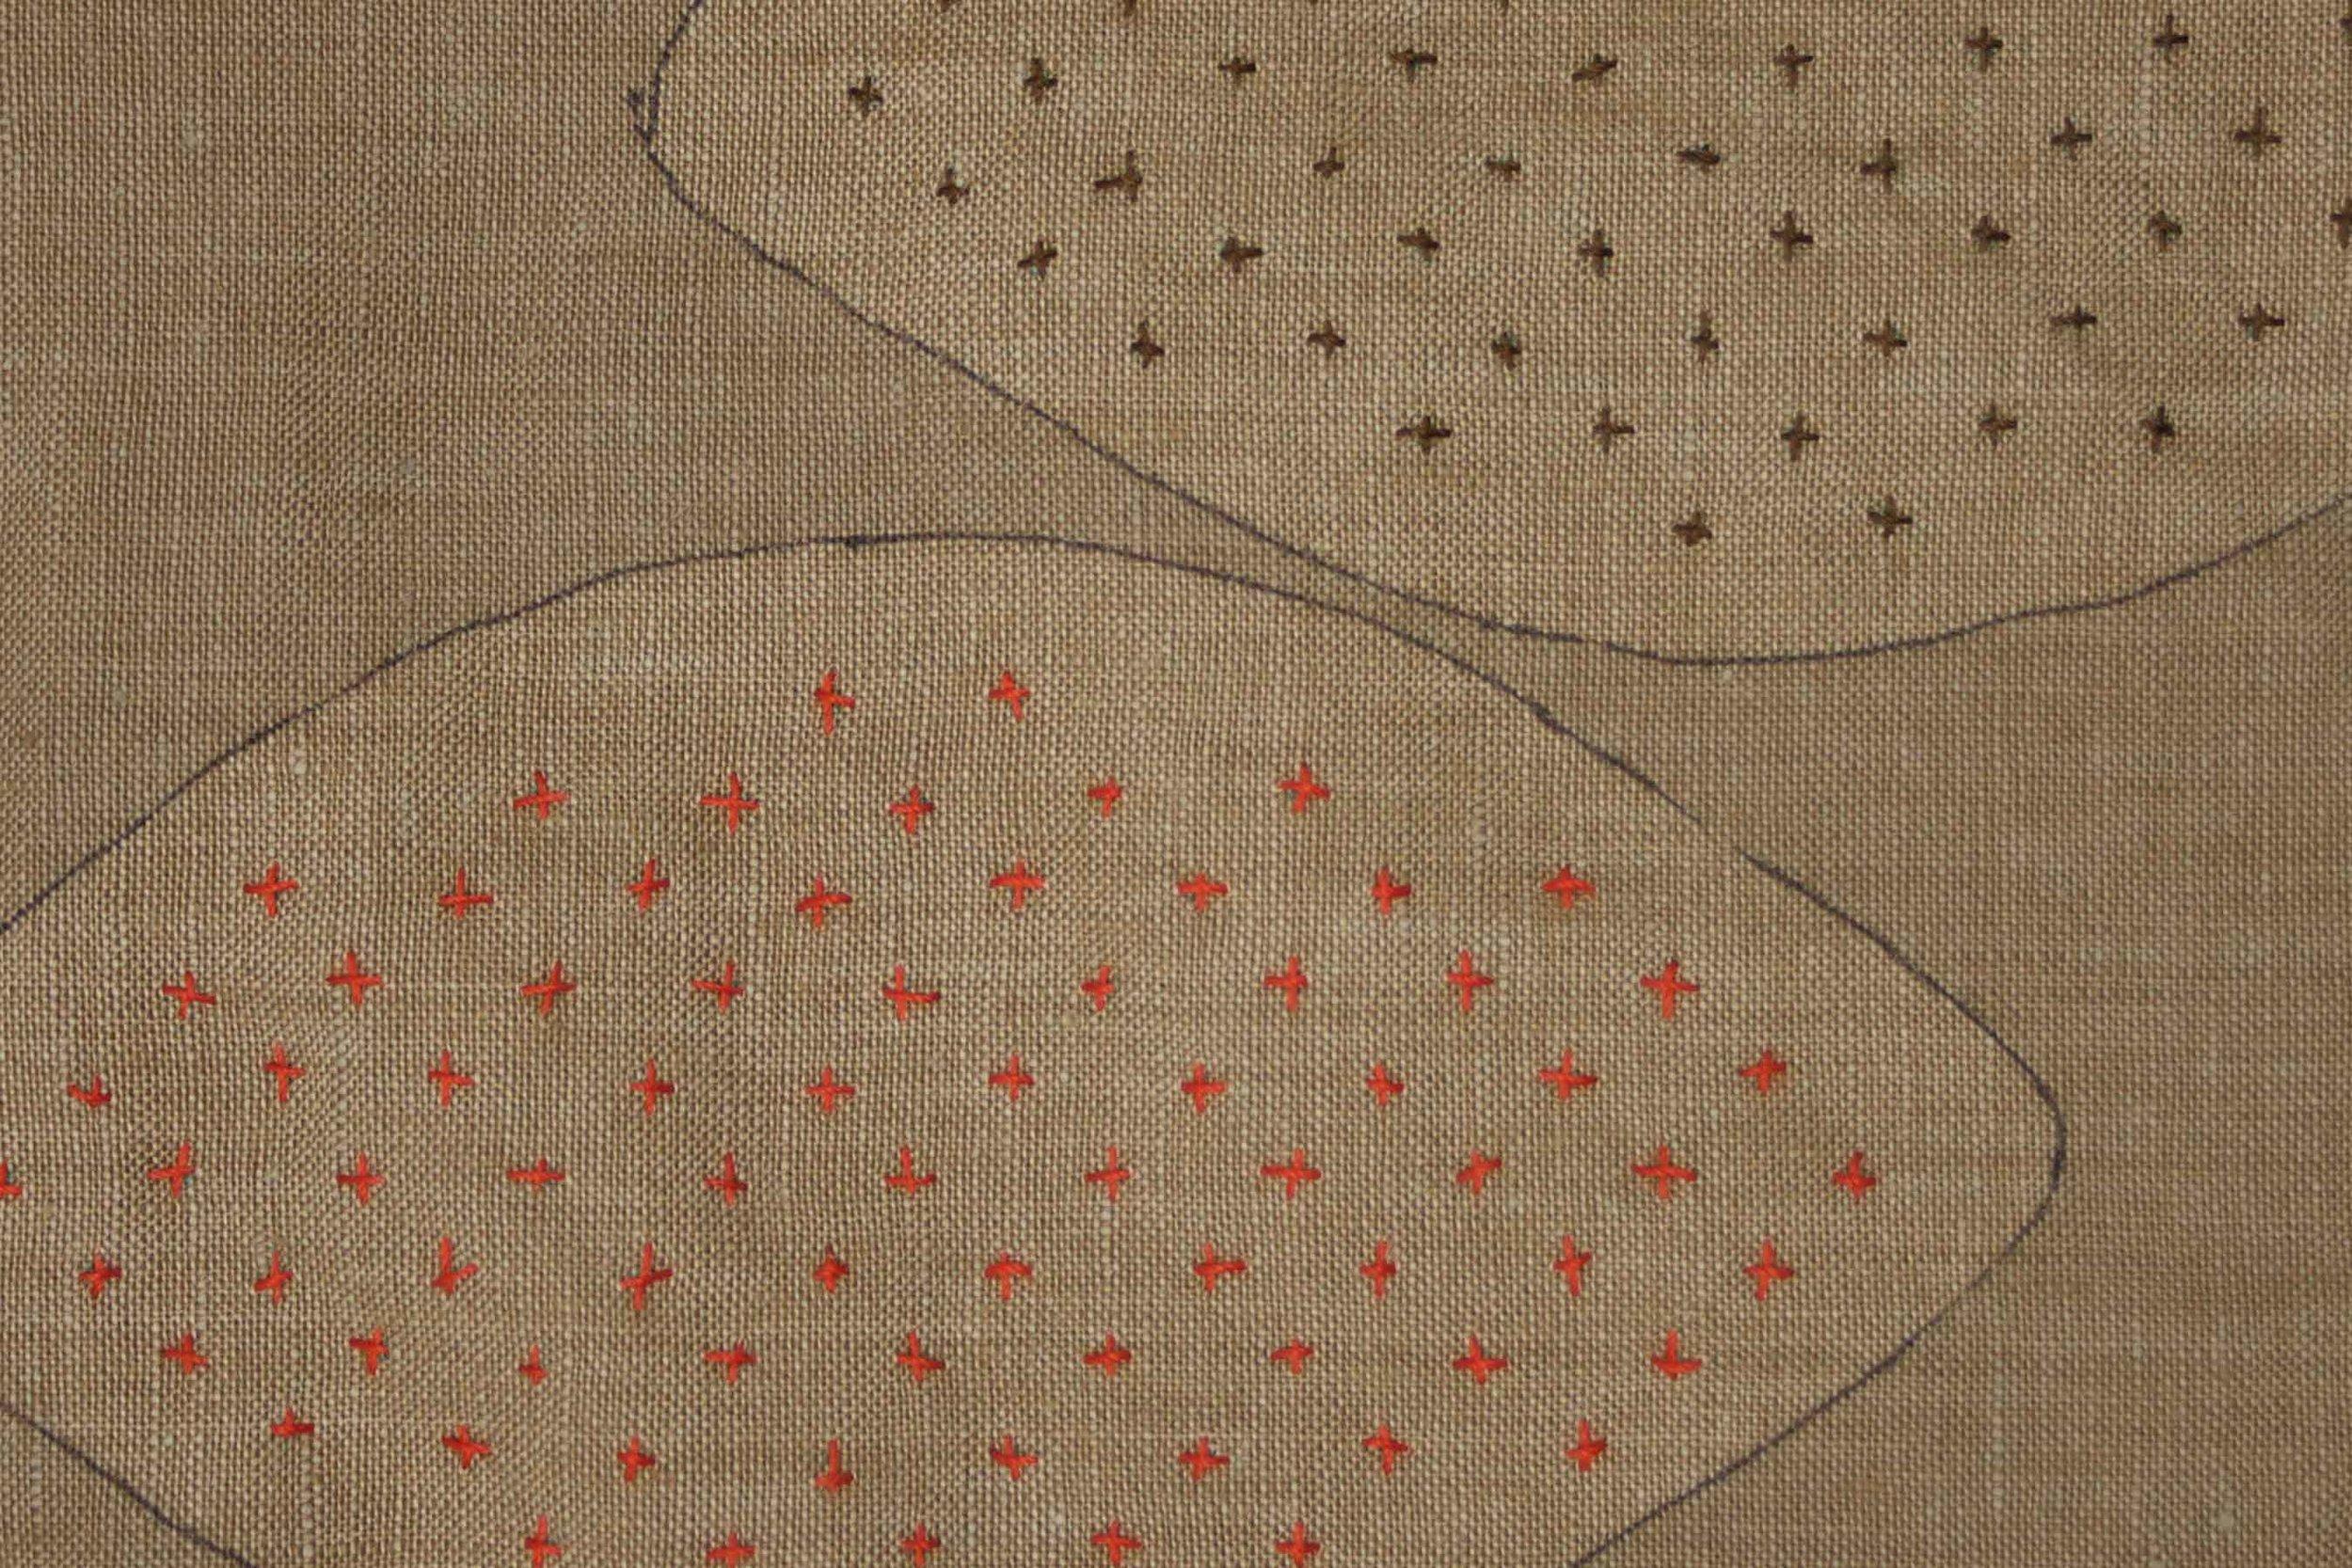 Sashiko style hand-stitching in colorful thread